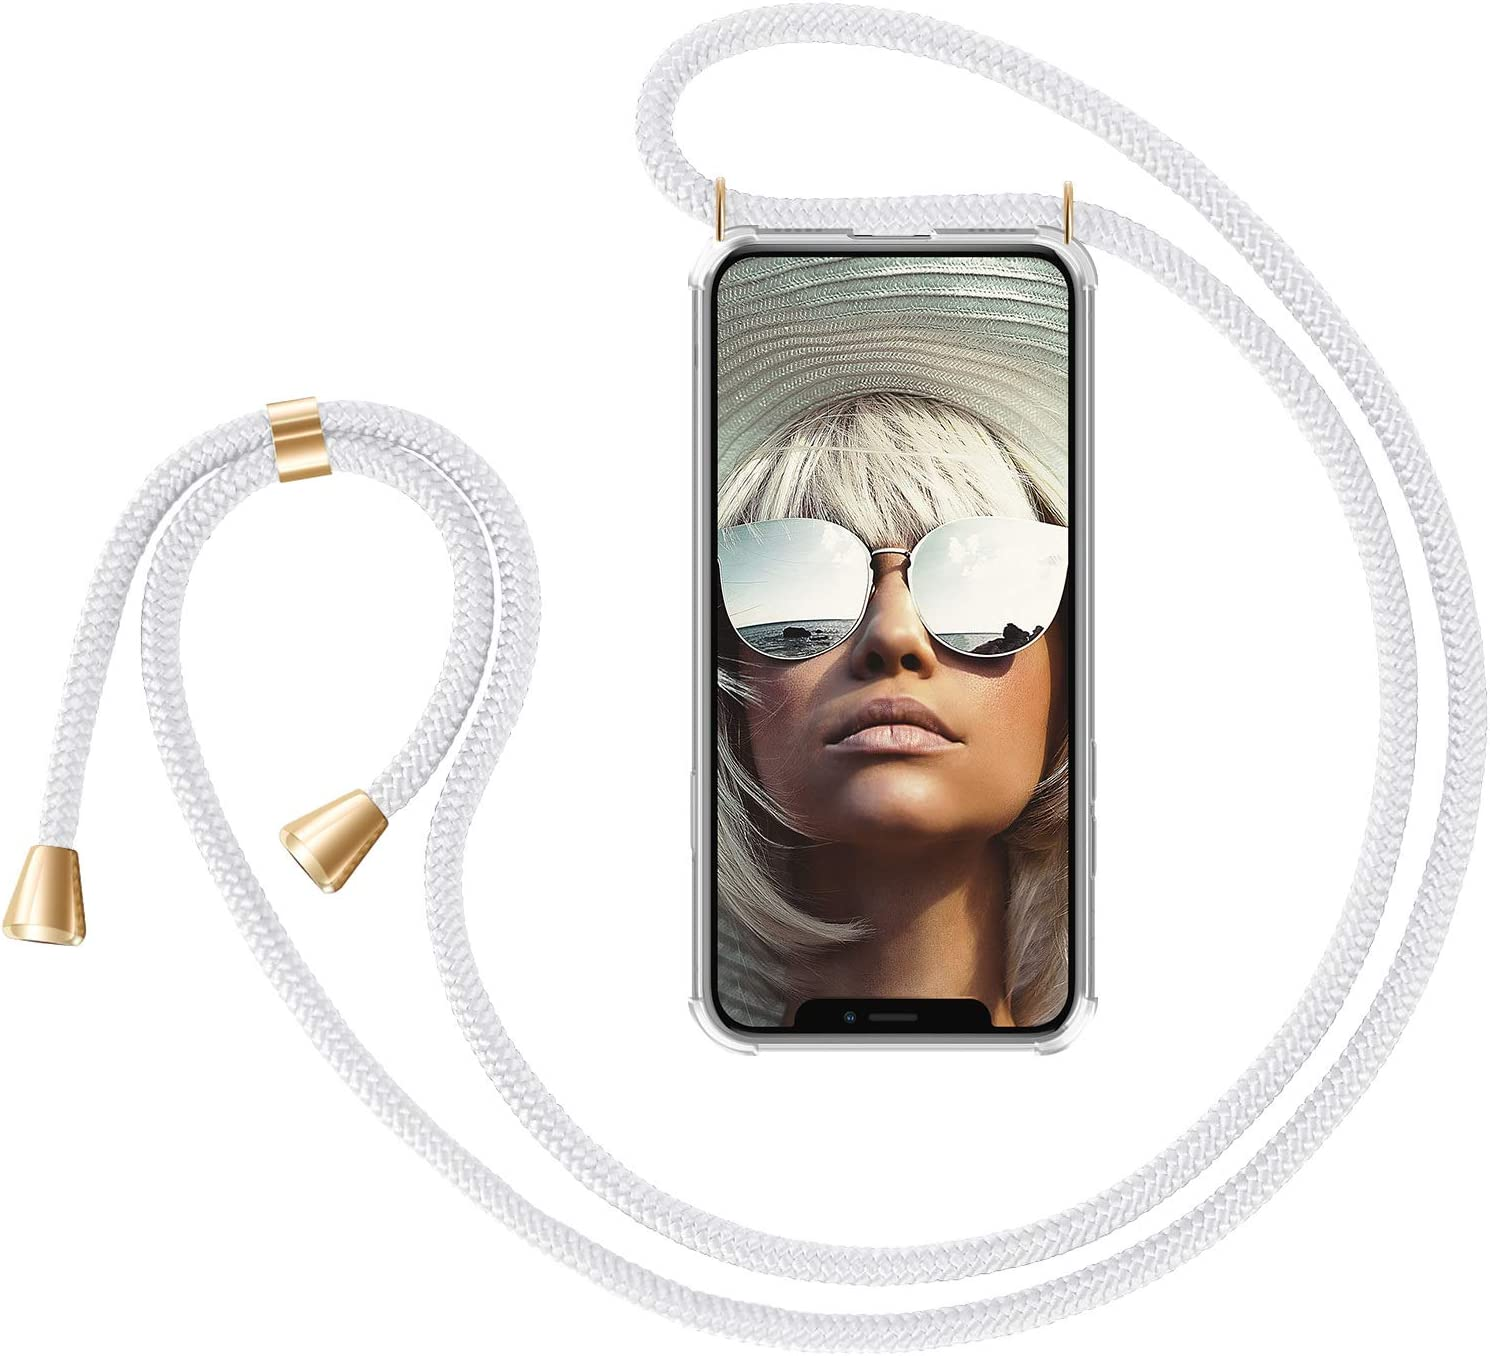 Carcasa con Correa para Celular para Llevar Negro Camuflaje ZhinkArts Cadena para Tel/éfono M/óvil Compatible con Apple iPhone X//XS Funda con Collar de Cord/ón para Smartphone